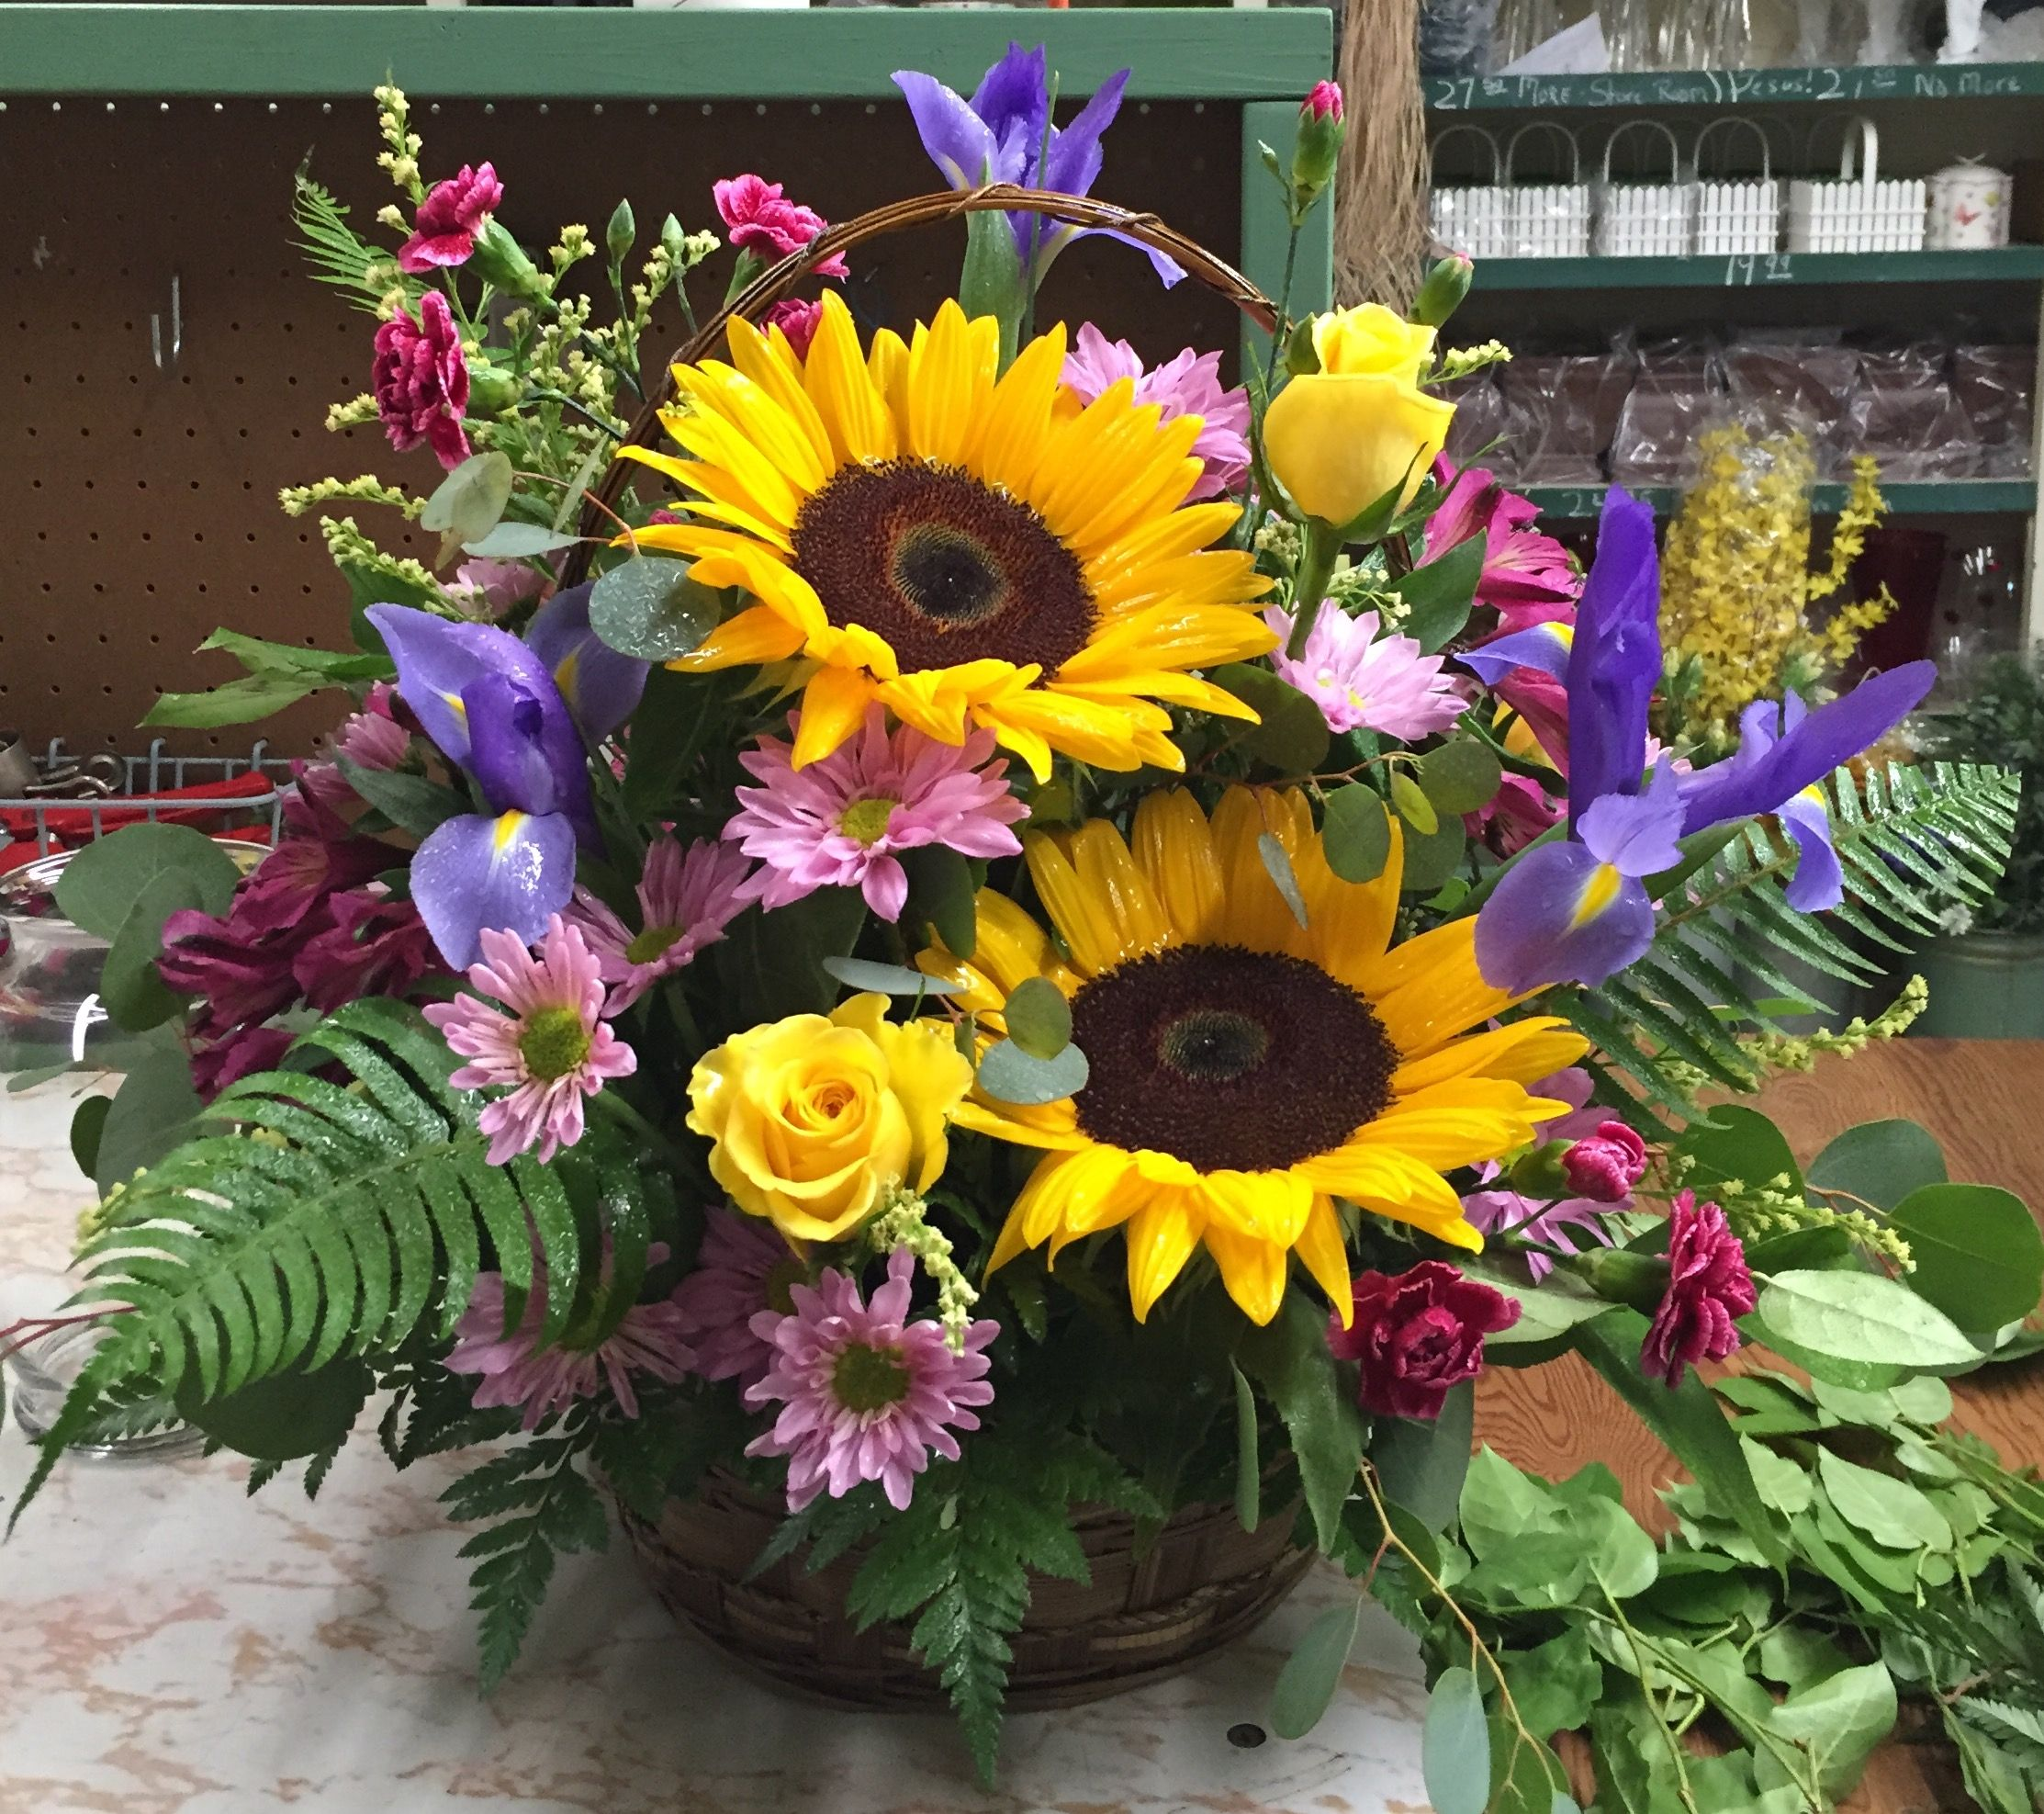 Petermans flower shop a beautiful spring summer arrangement petermans flower shop a beautiful spring summer arrangement izmirmasajfo Gallery